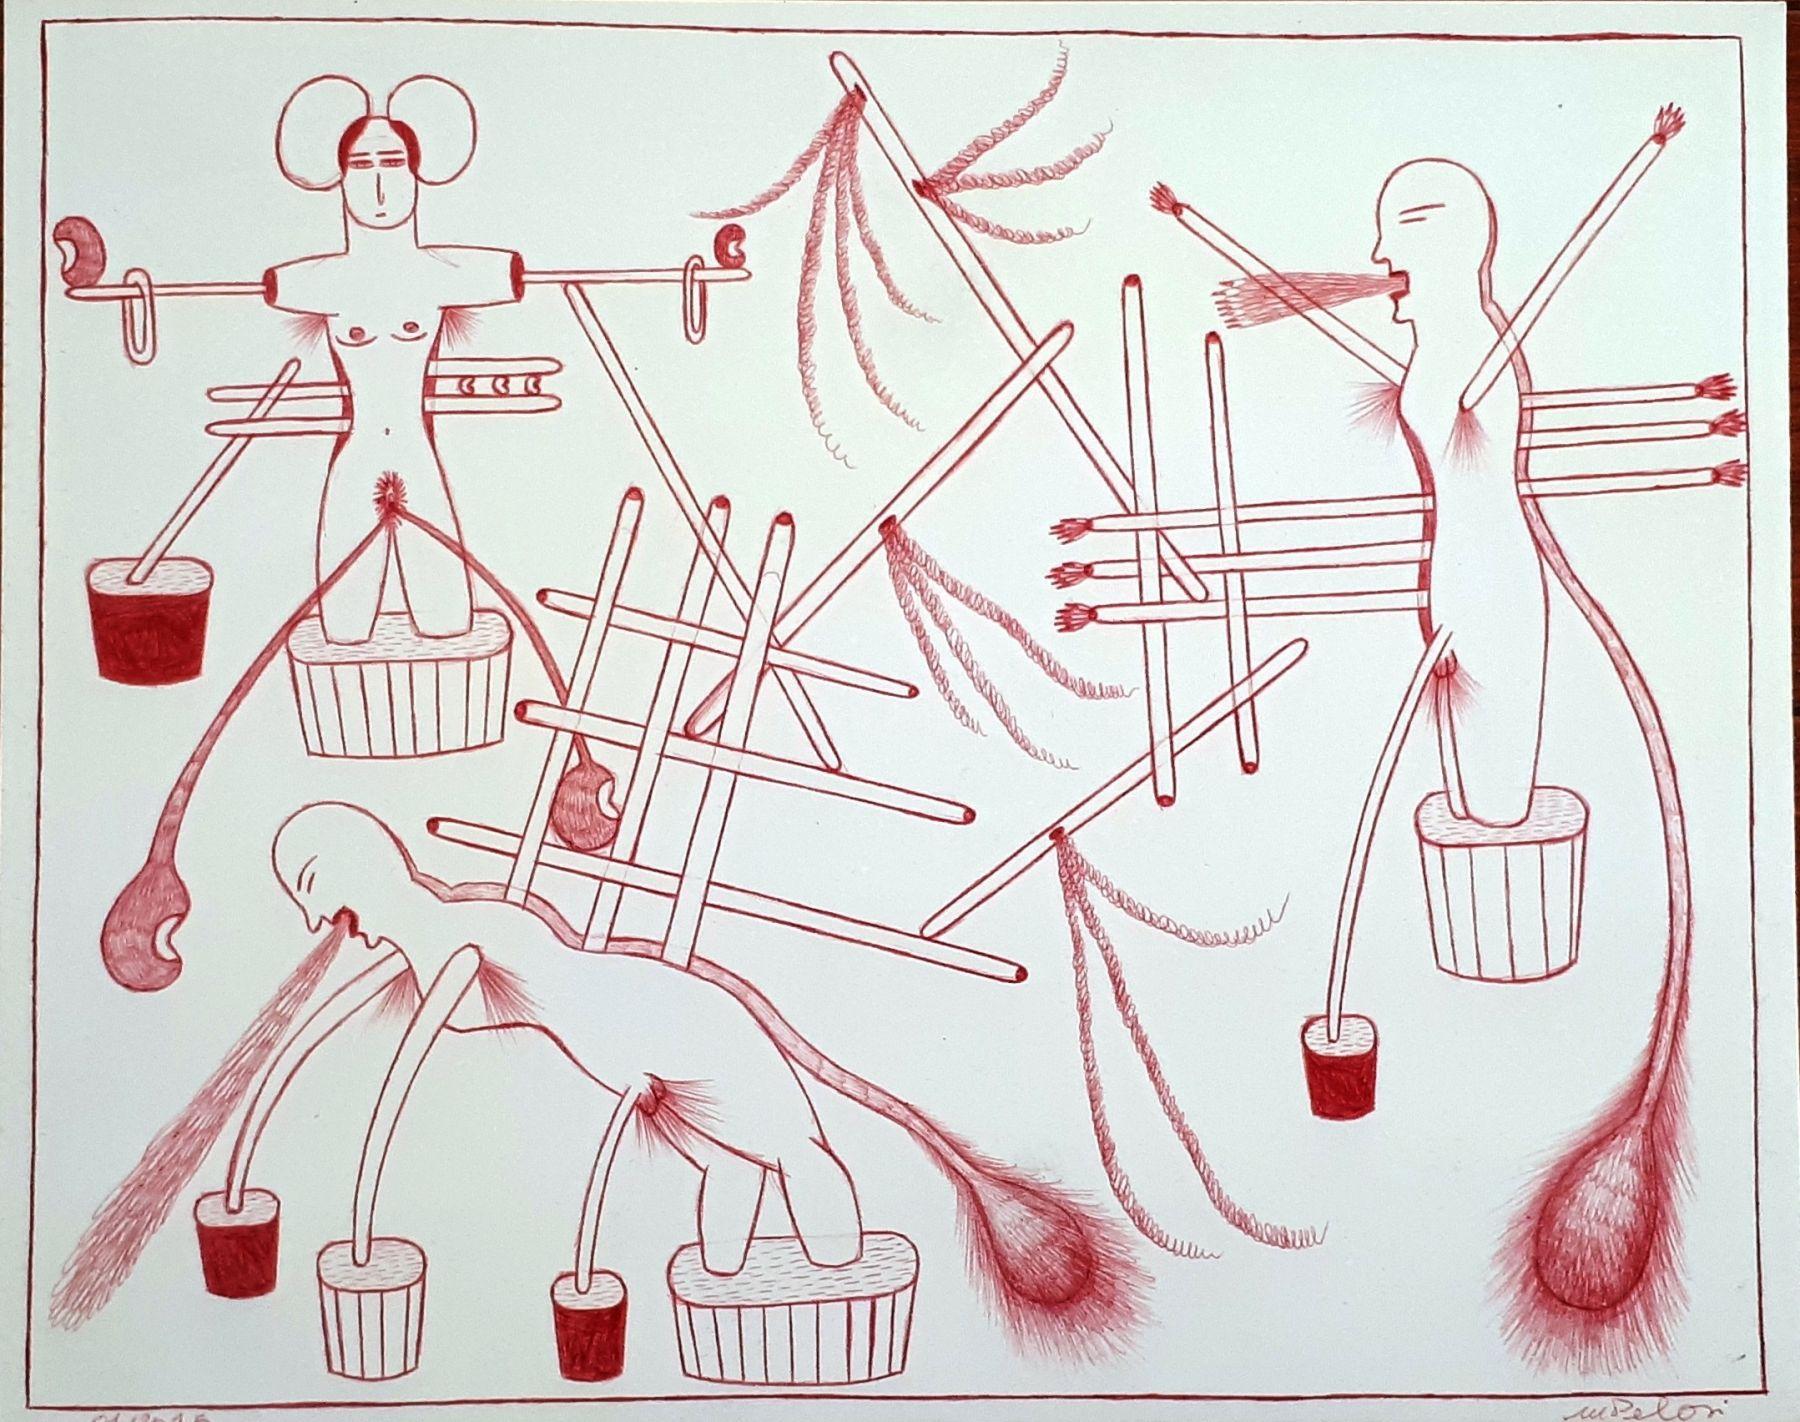 Marilena Pelosi(1957) Brazil, Untitled, 2015, Ballpoint pen on paper, 9.5 x 12 in